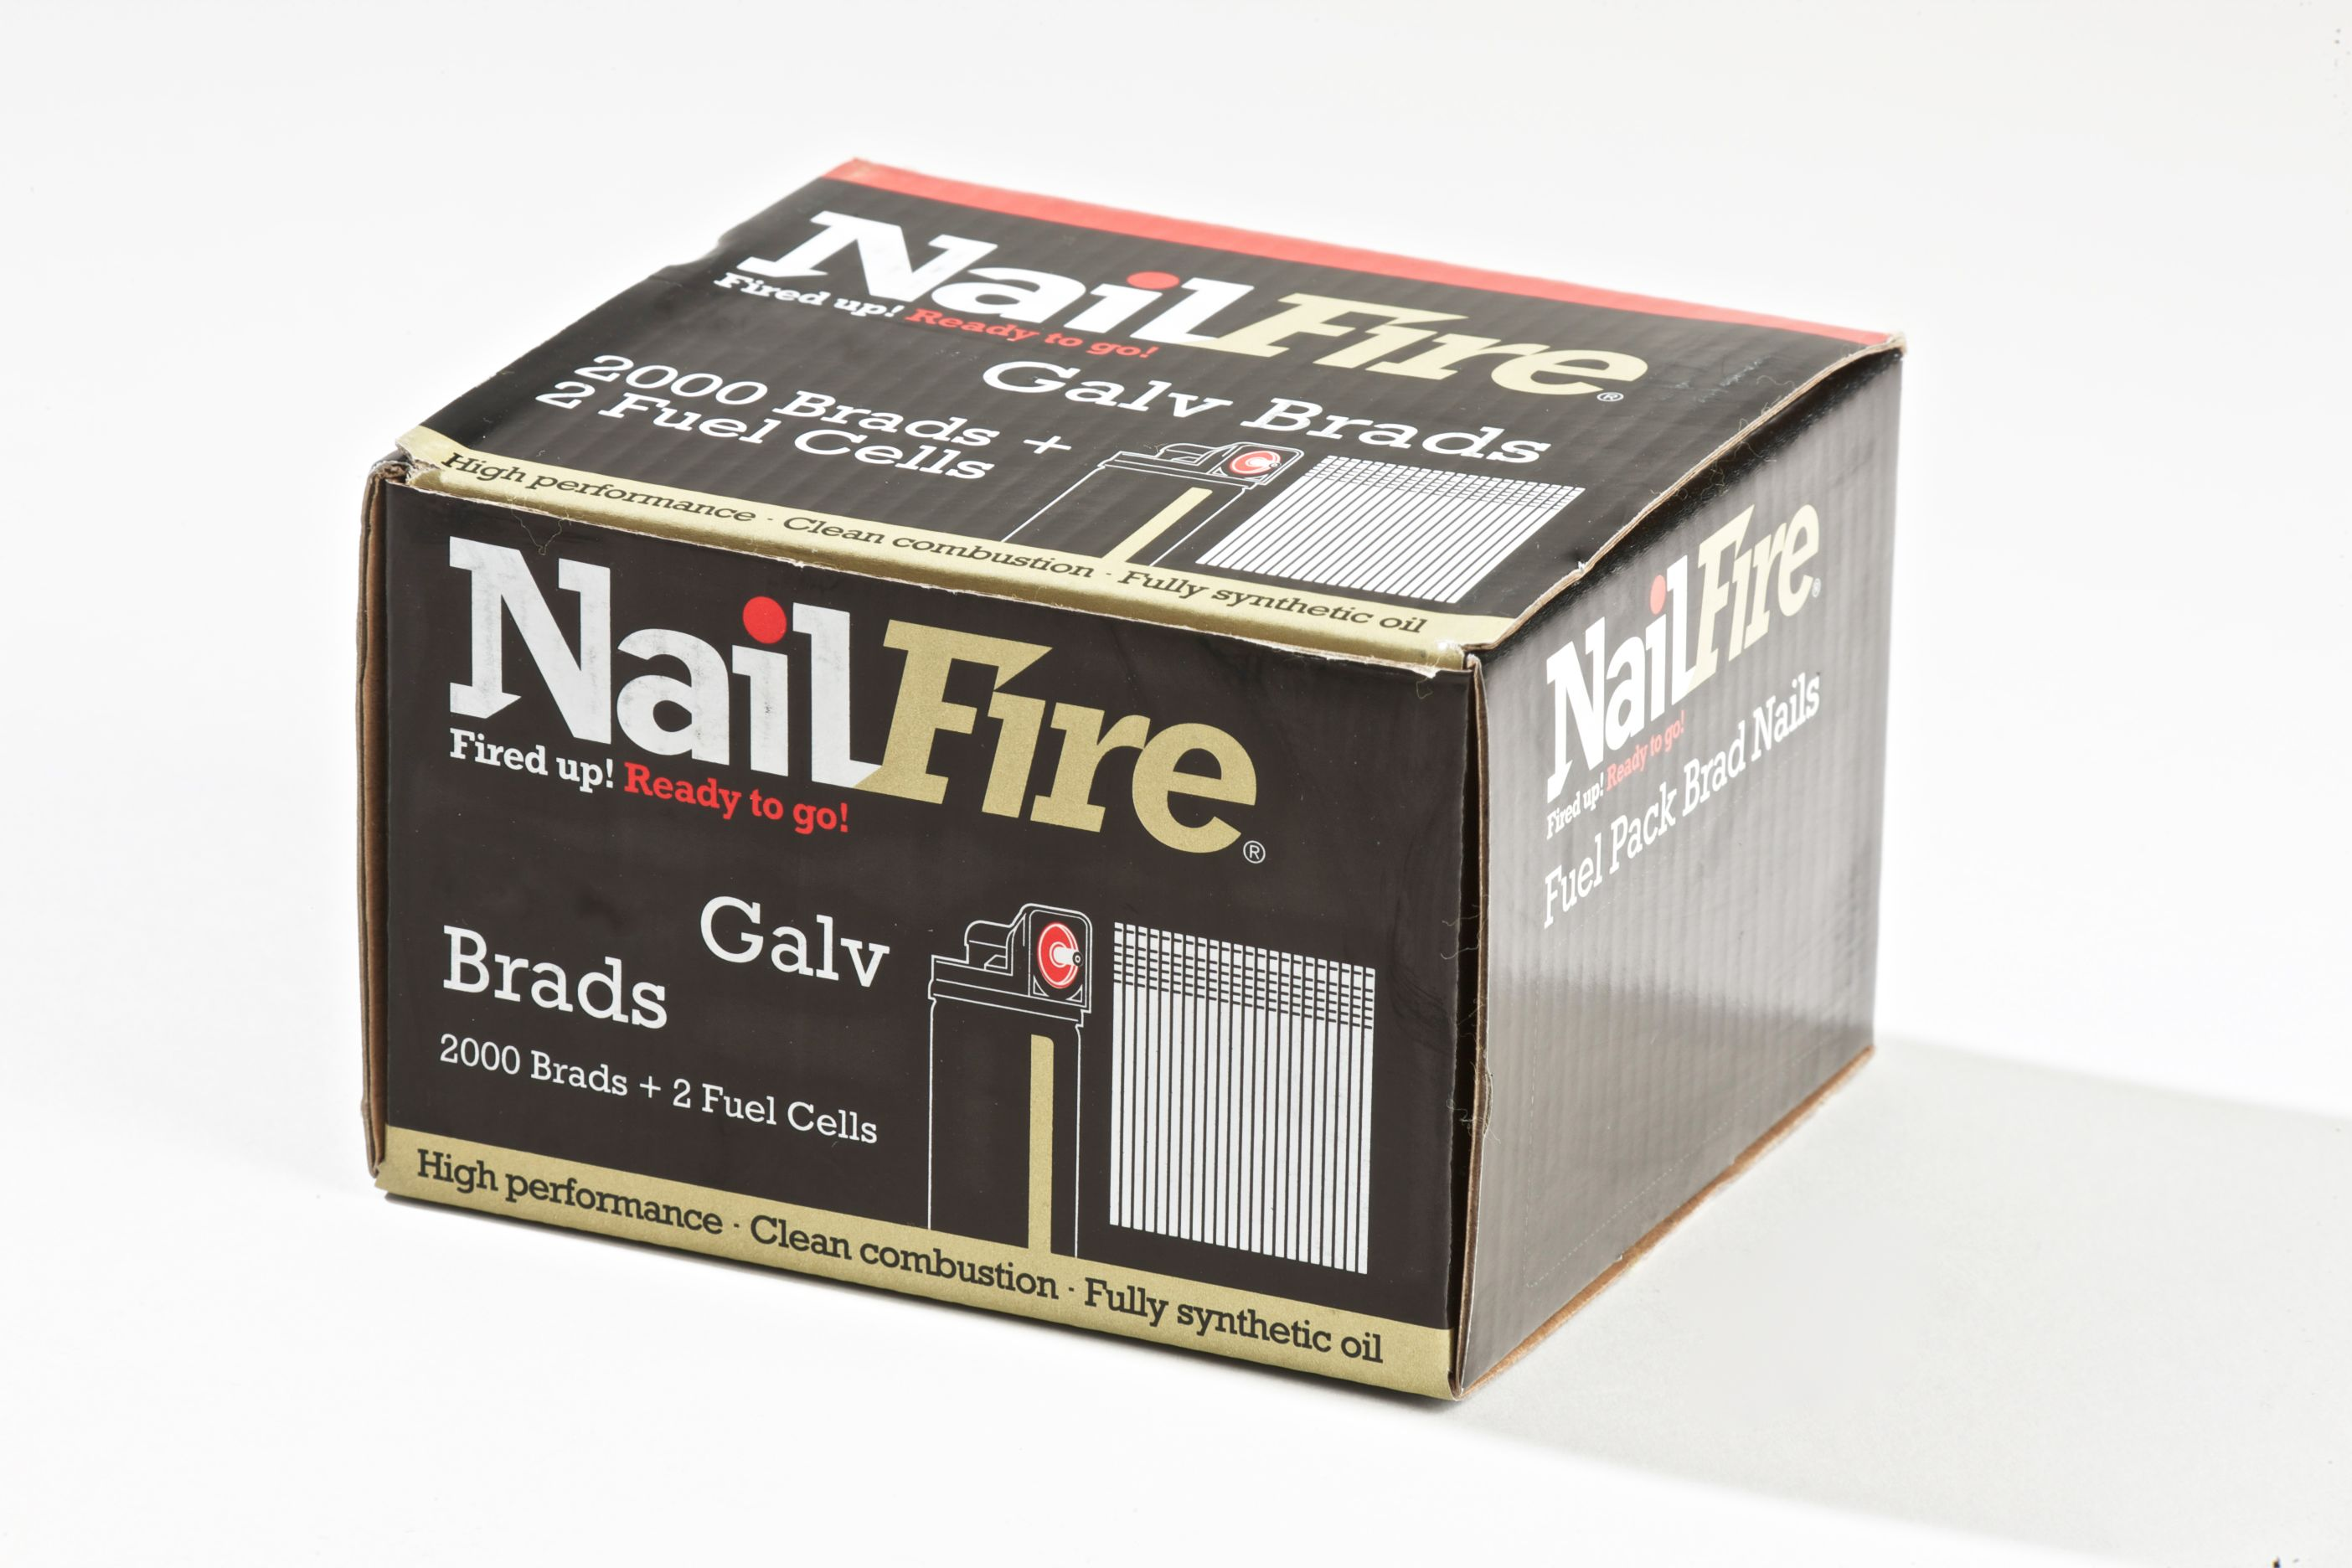 NAILFIRE 2ND FIX STRAIGHT E-GALV BRAD & FUEL PACK 32MM (TUB OF 2000)